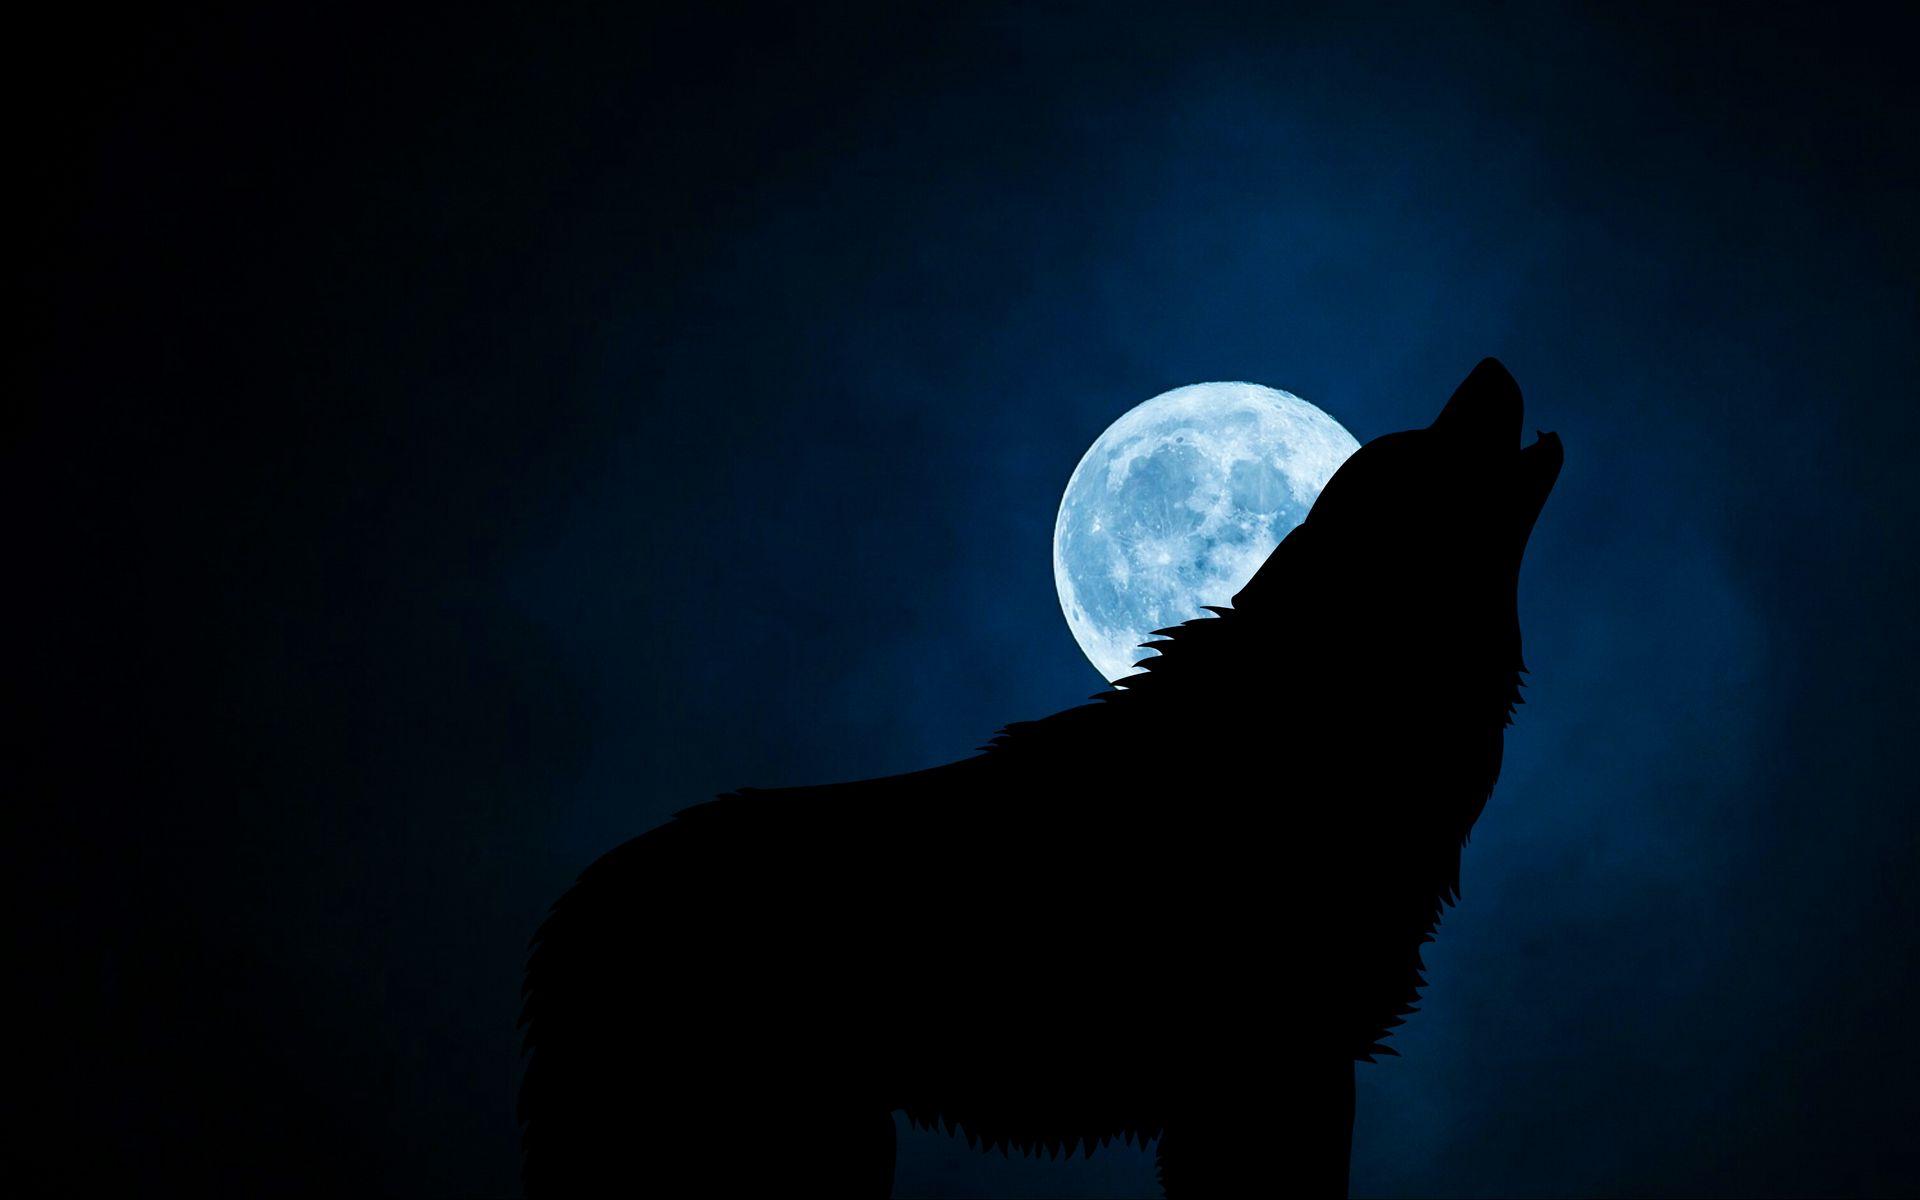 1920x1200 Wallpaper wolf, silhouette, moon, night